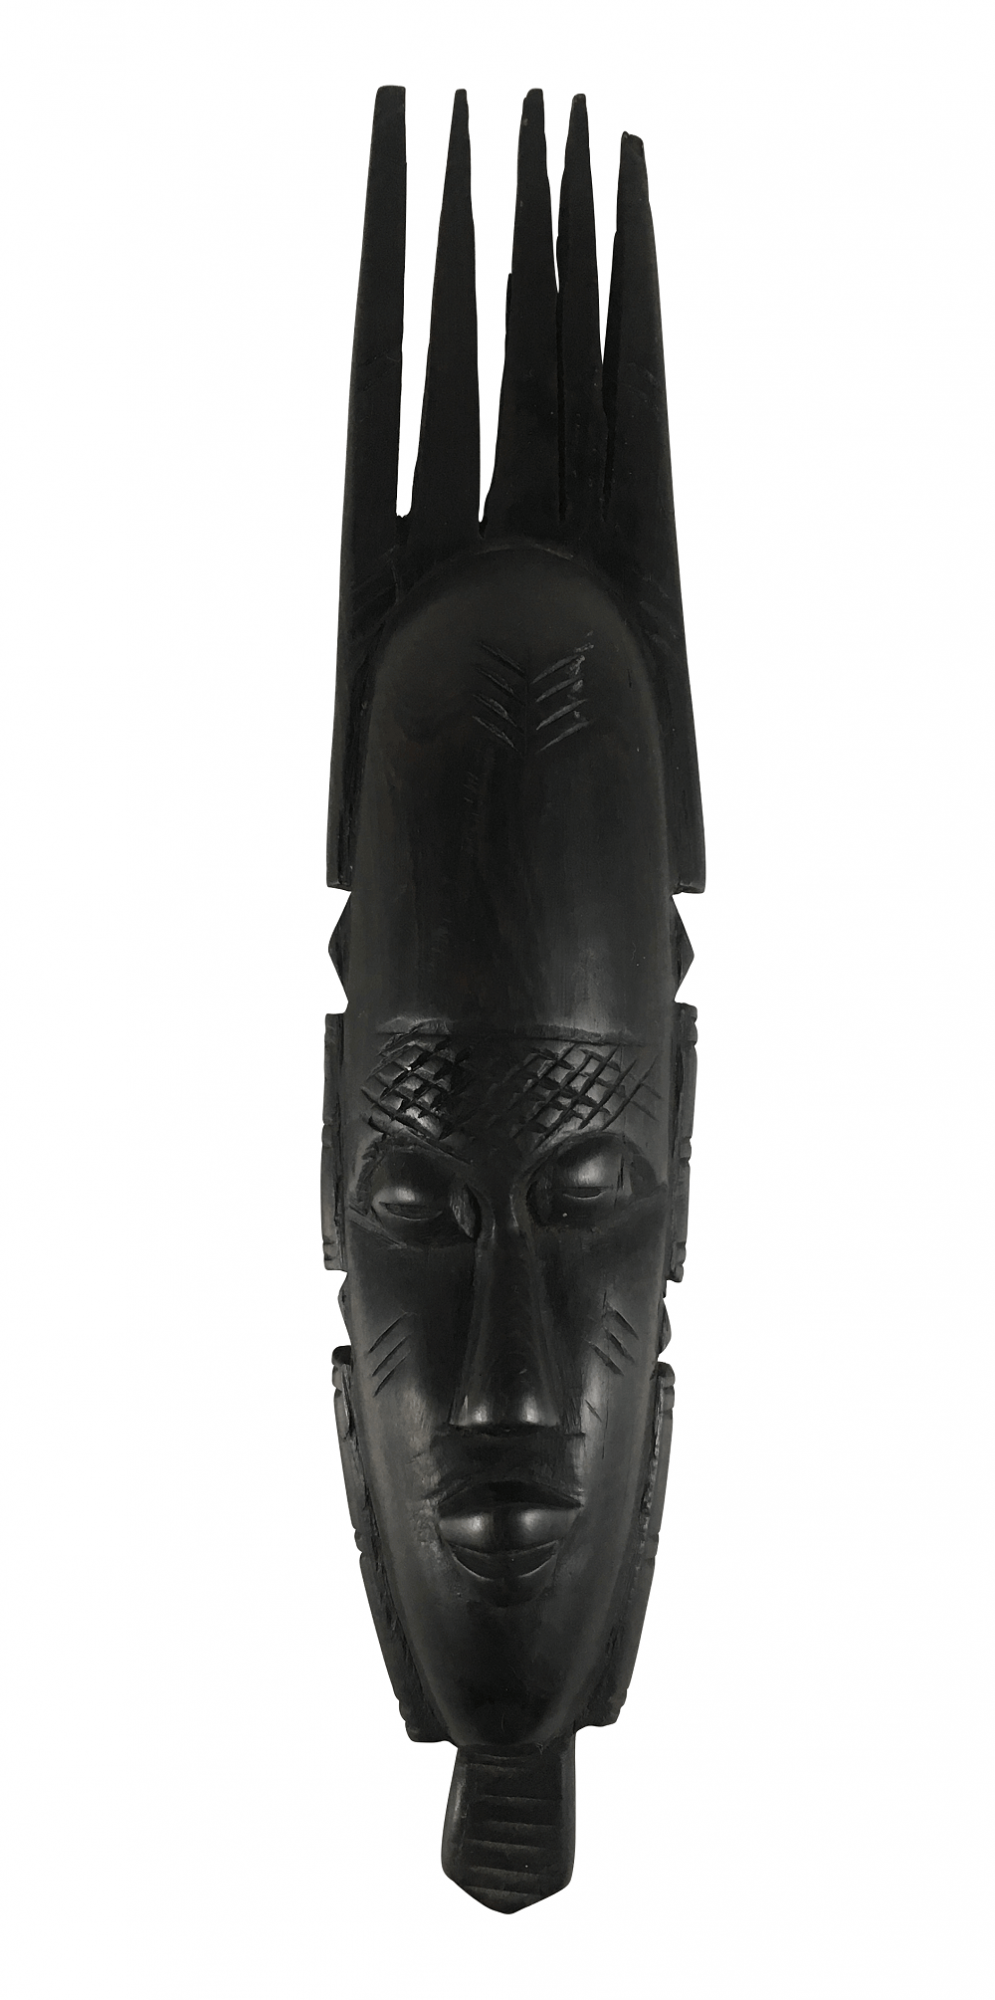 Antiga Escultura Africana Madeira Ebano